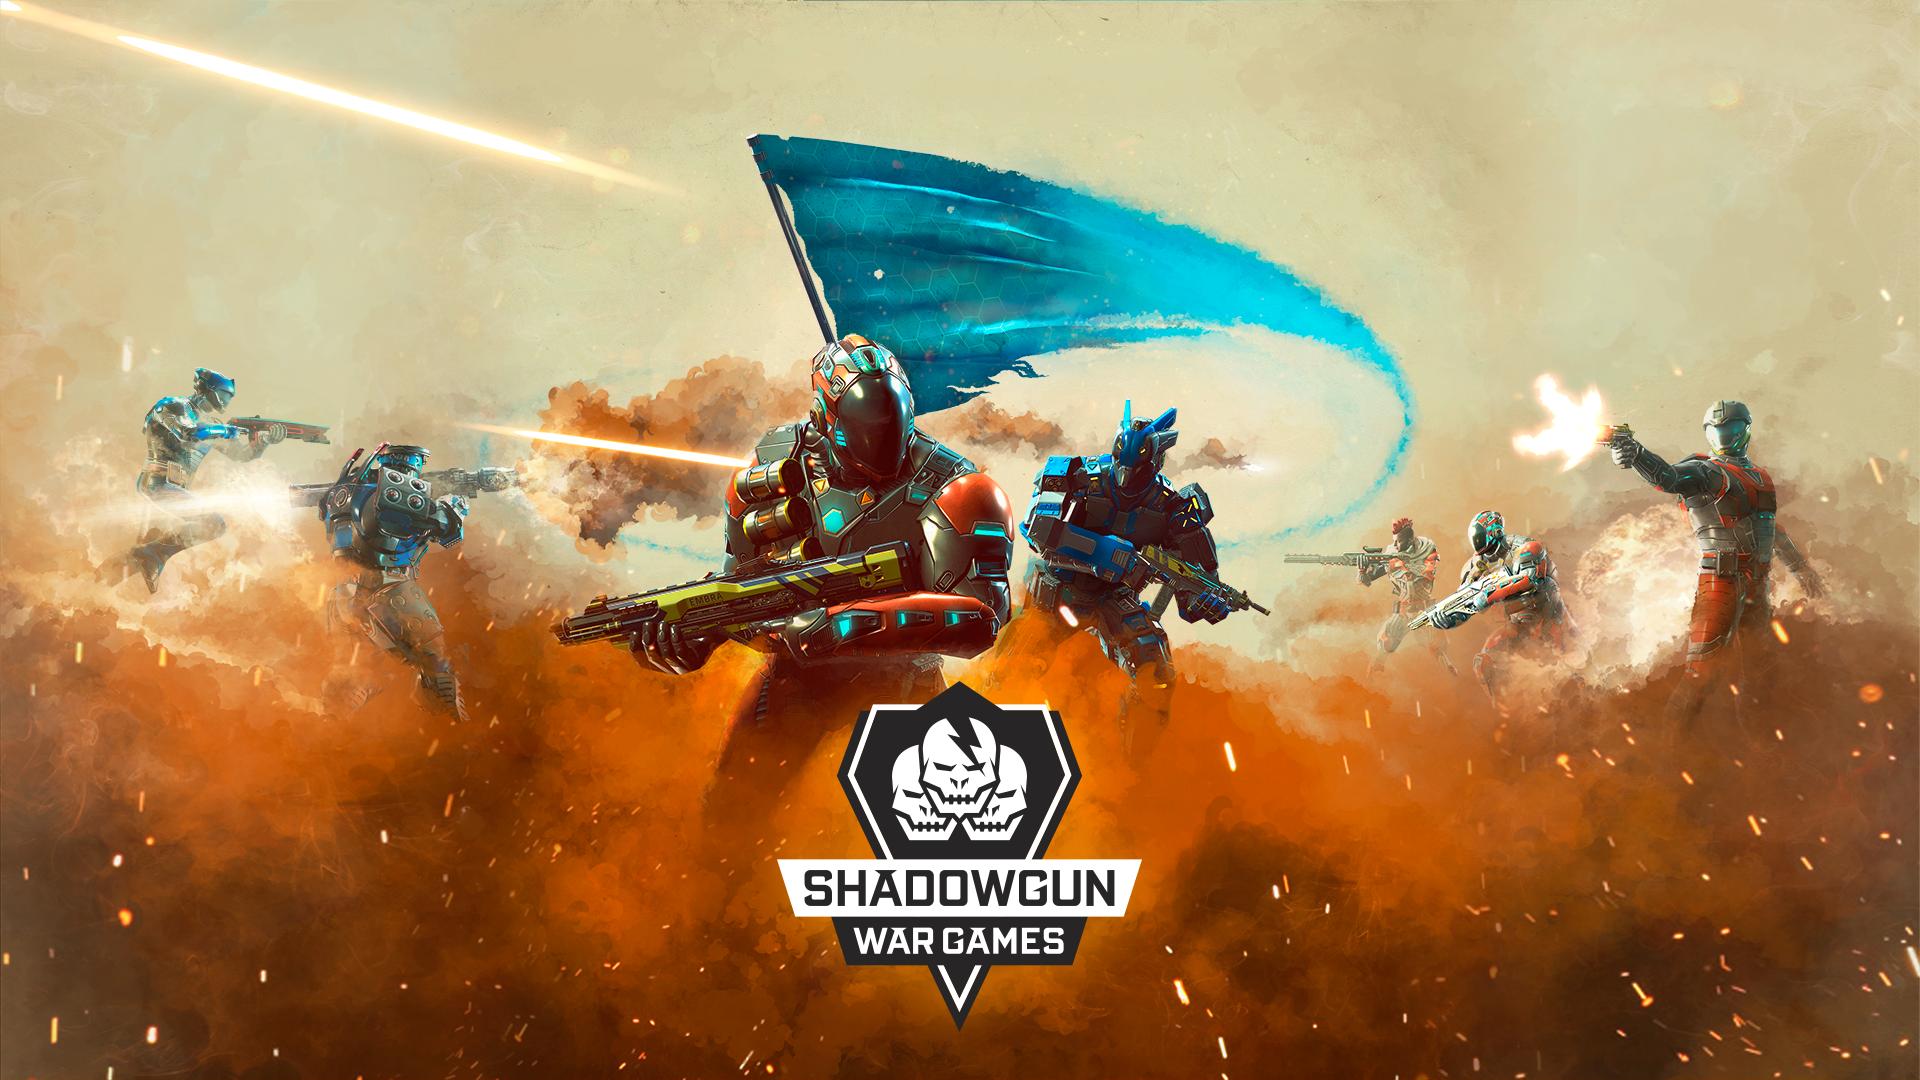 SHADOWGUN War Games for PC